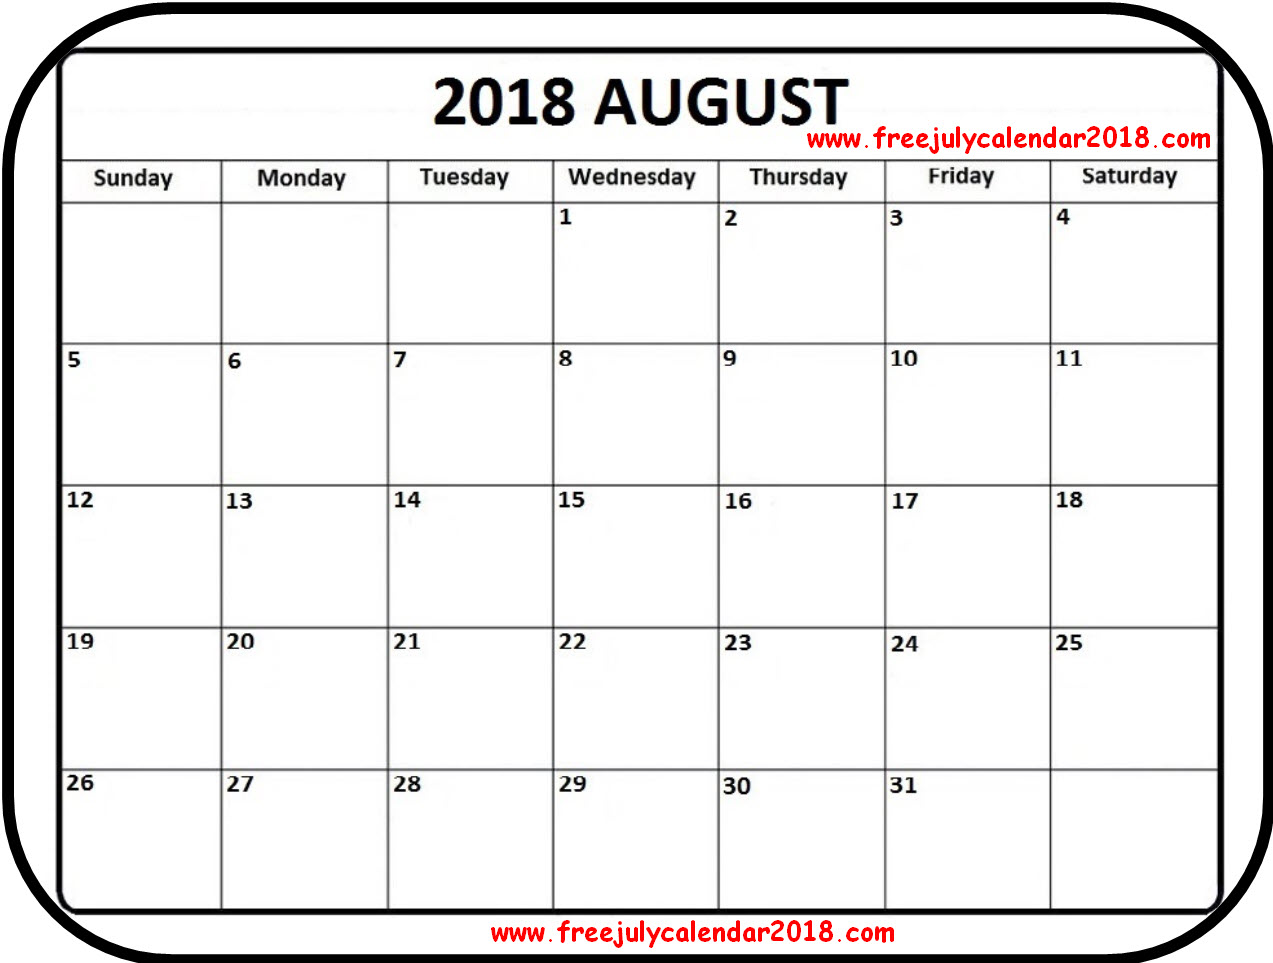 2018 August Calendar PDF